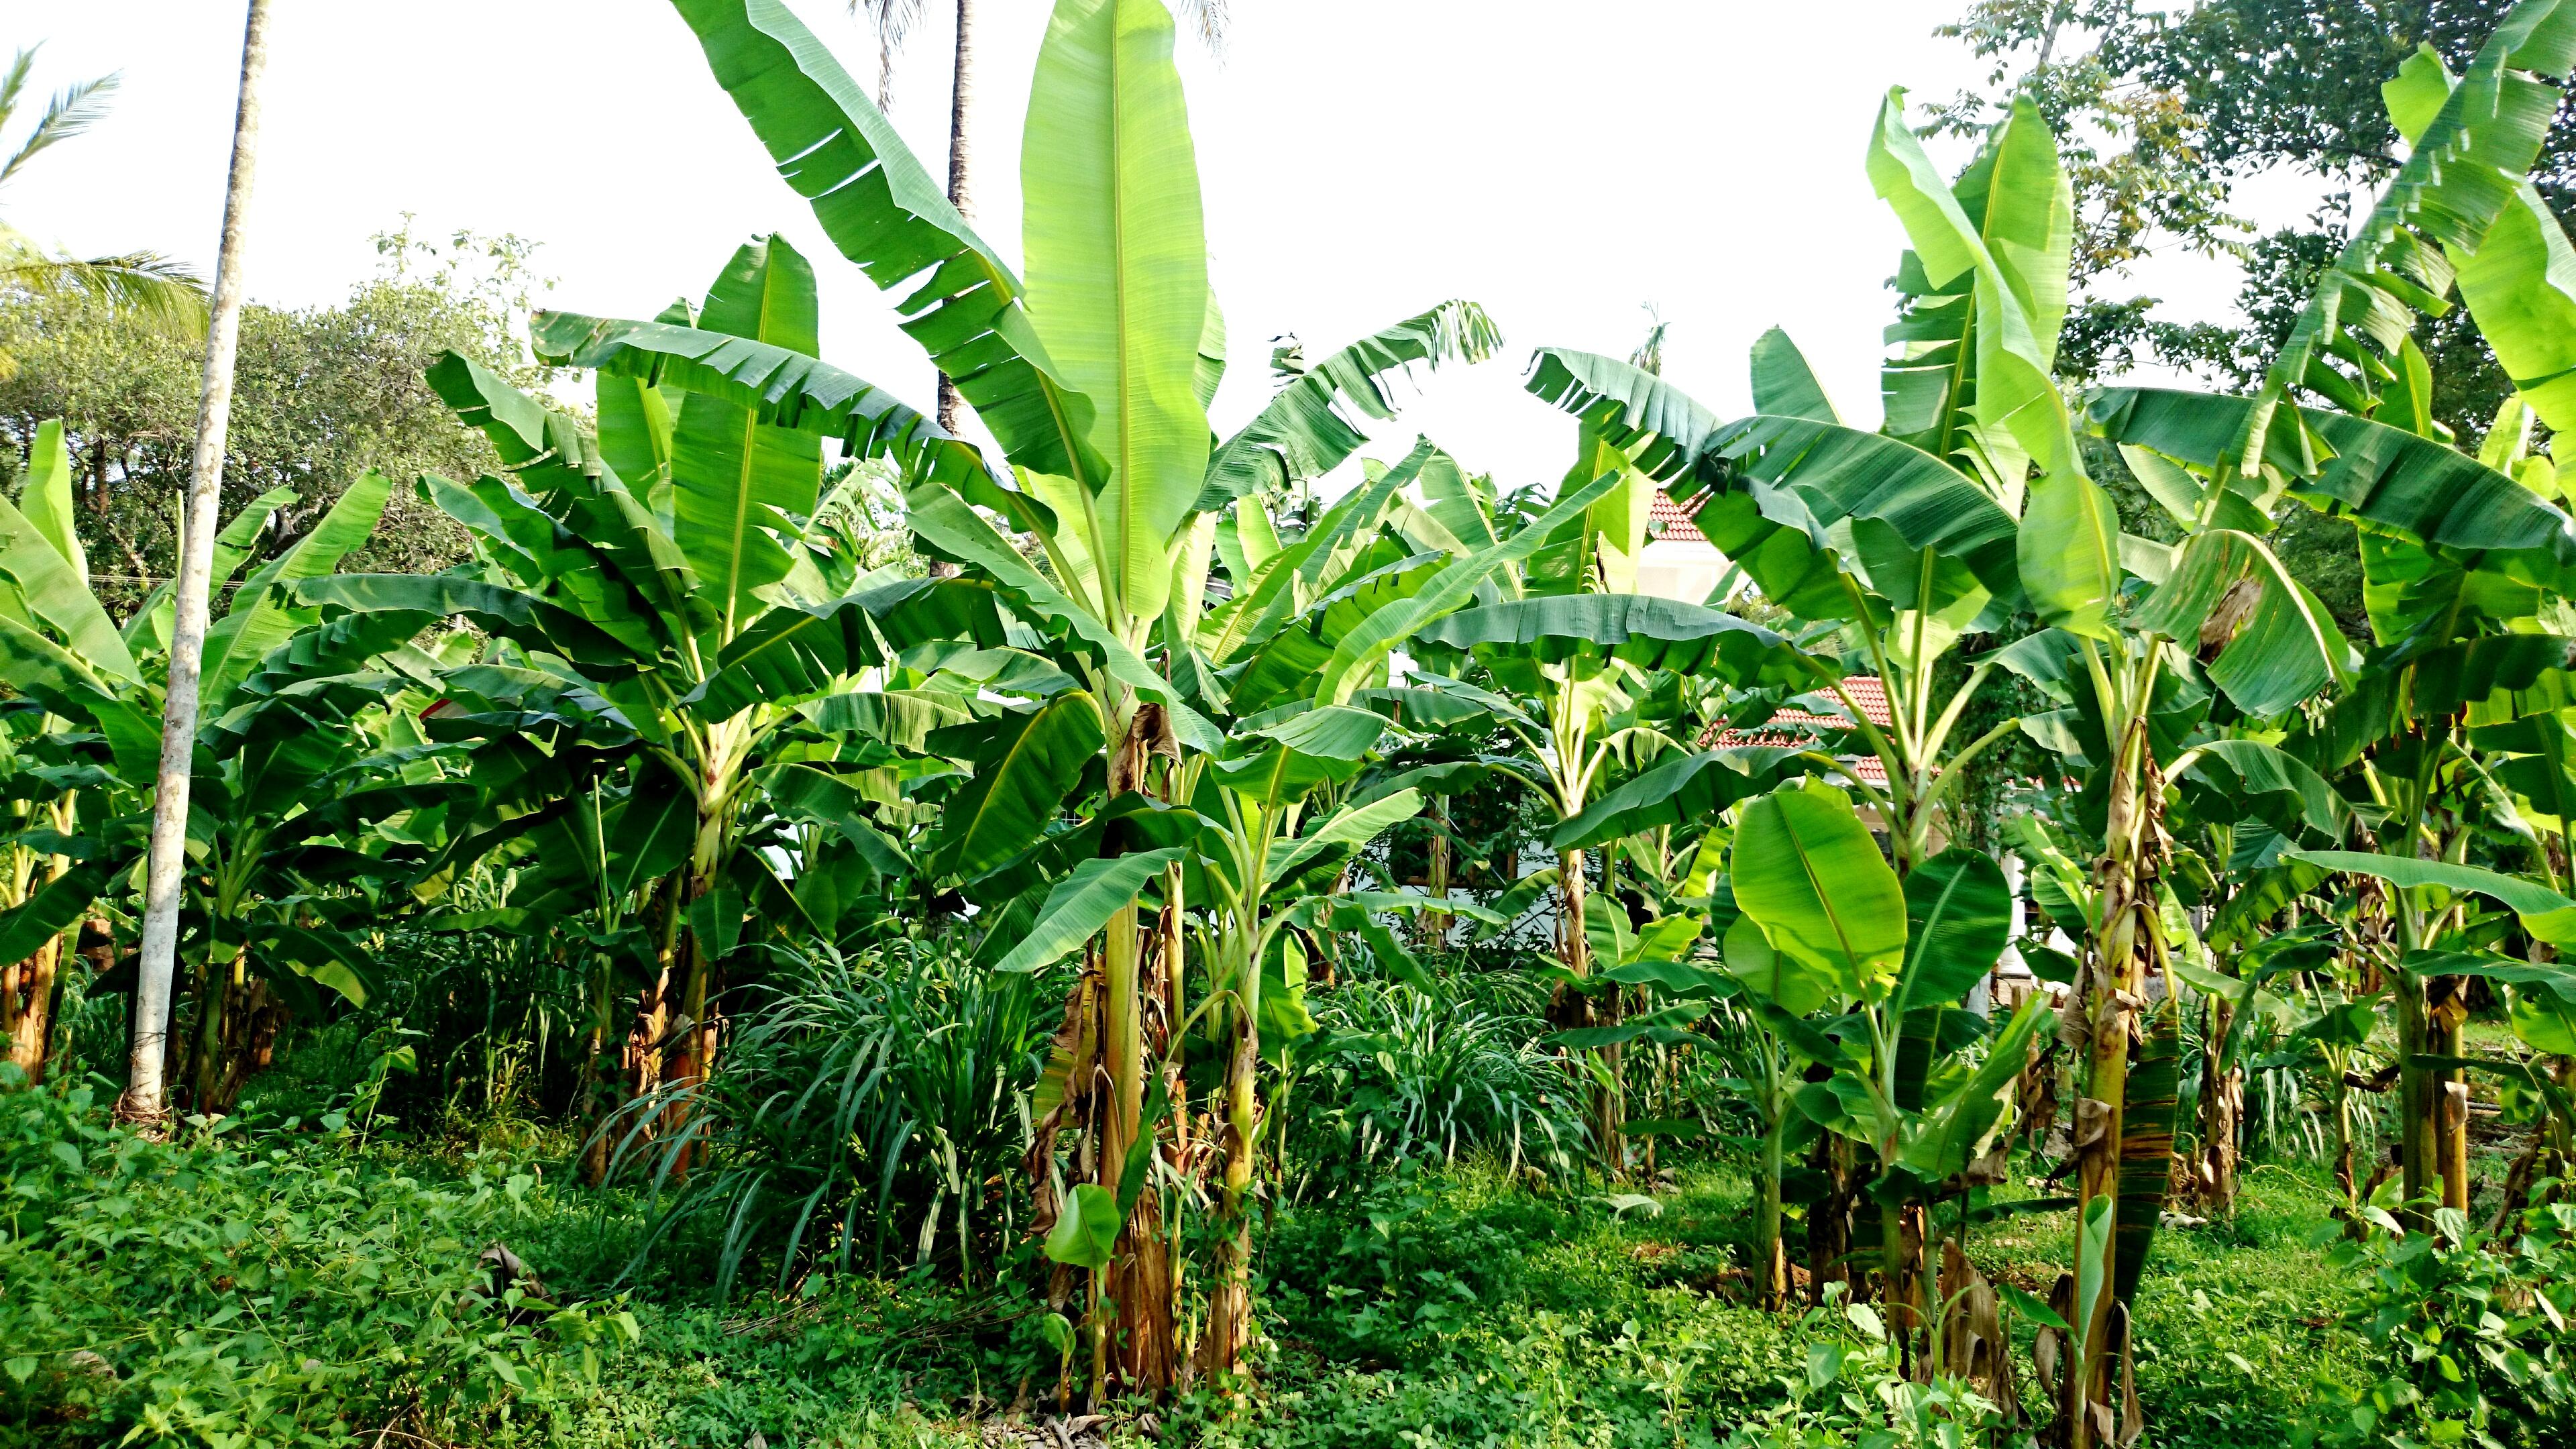 File:Banana plants (14044660825).jpg - Wikimedia Commons